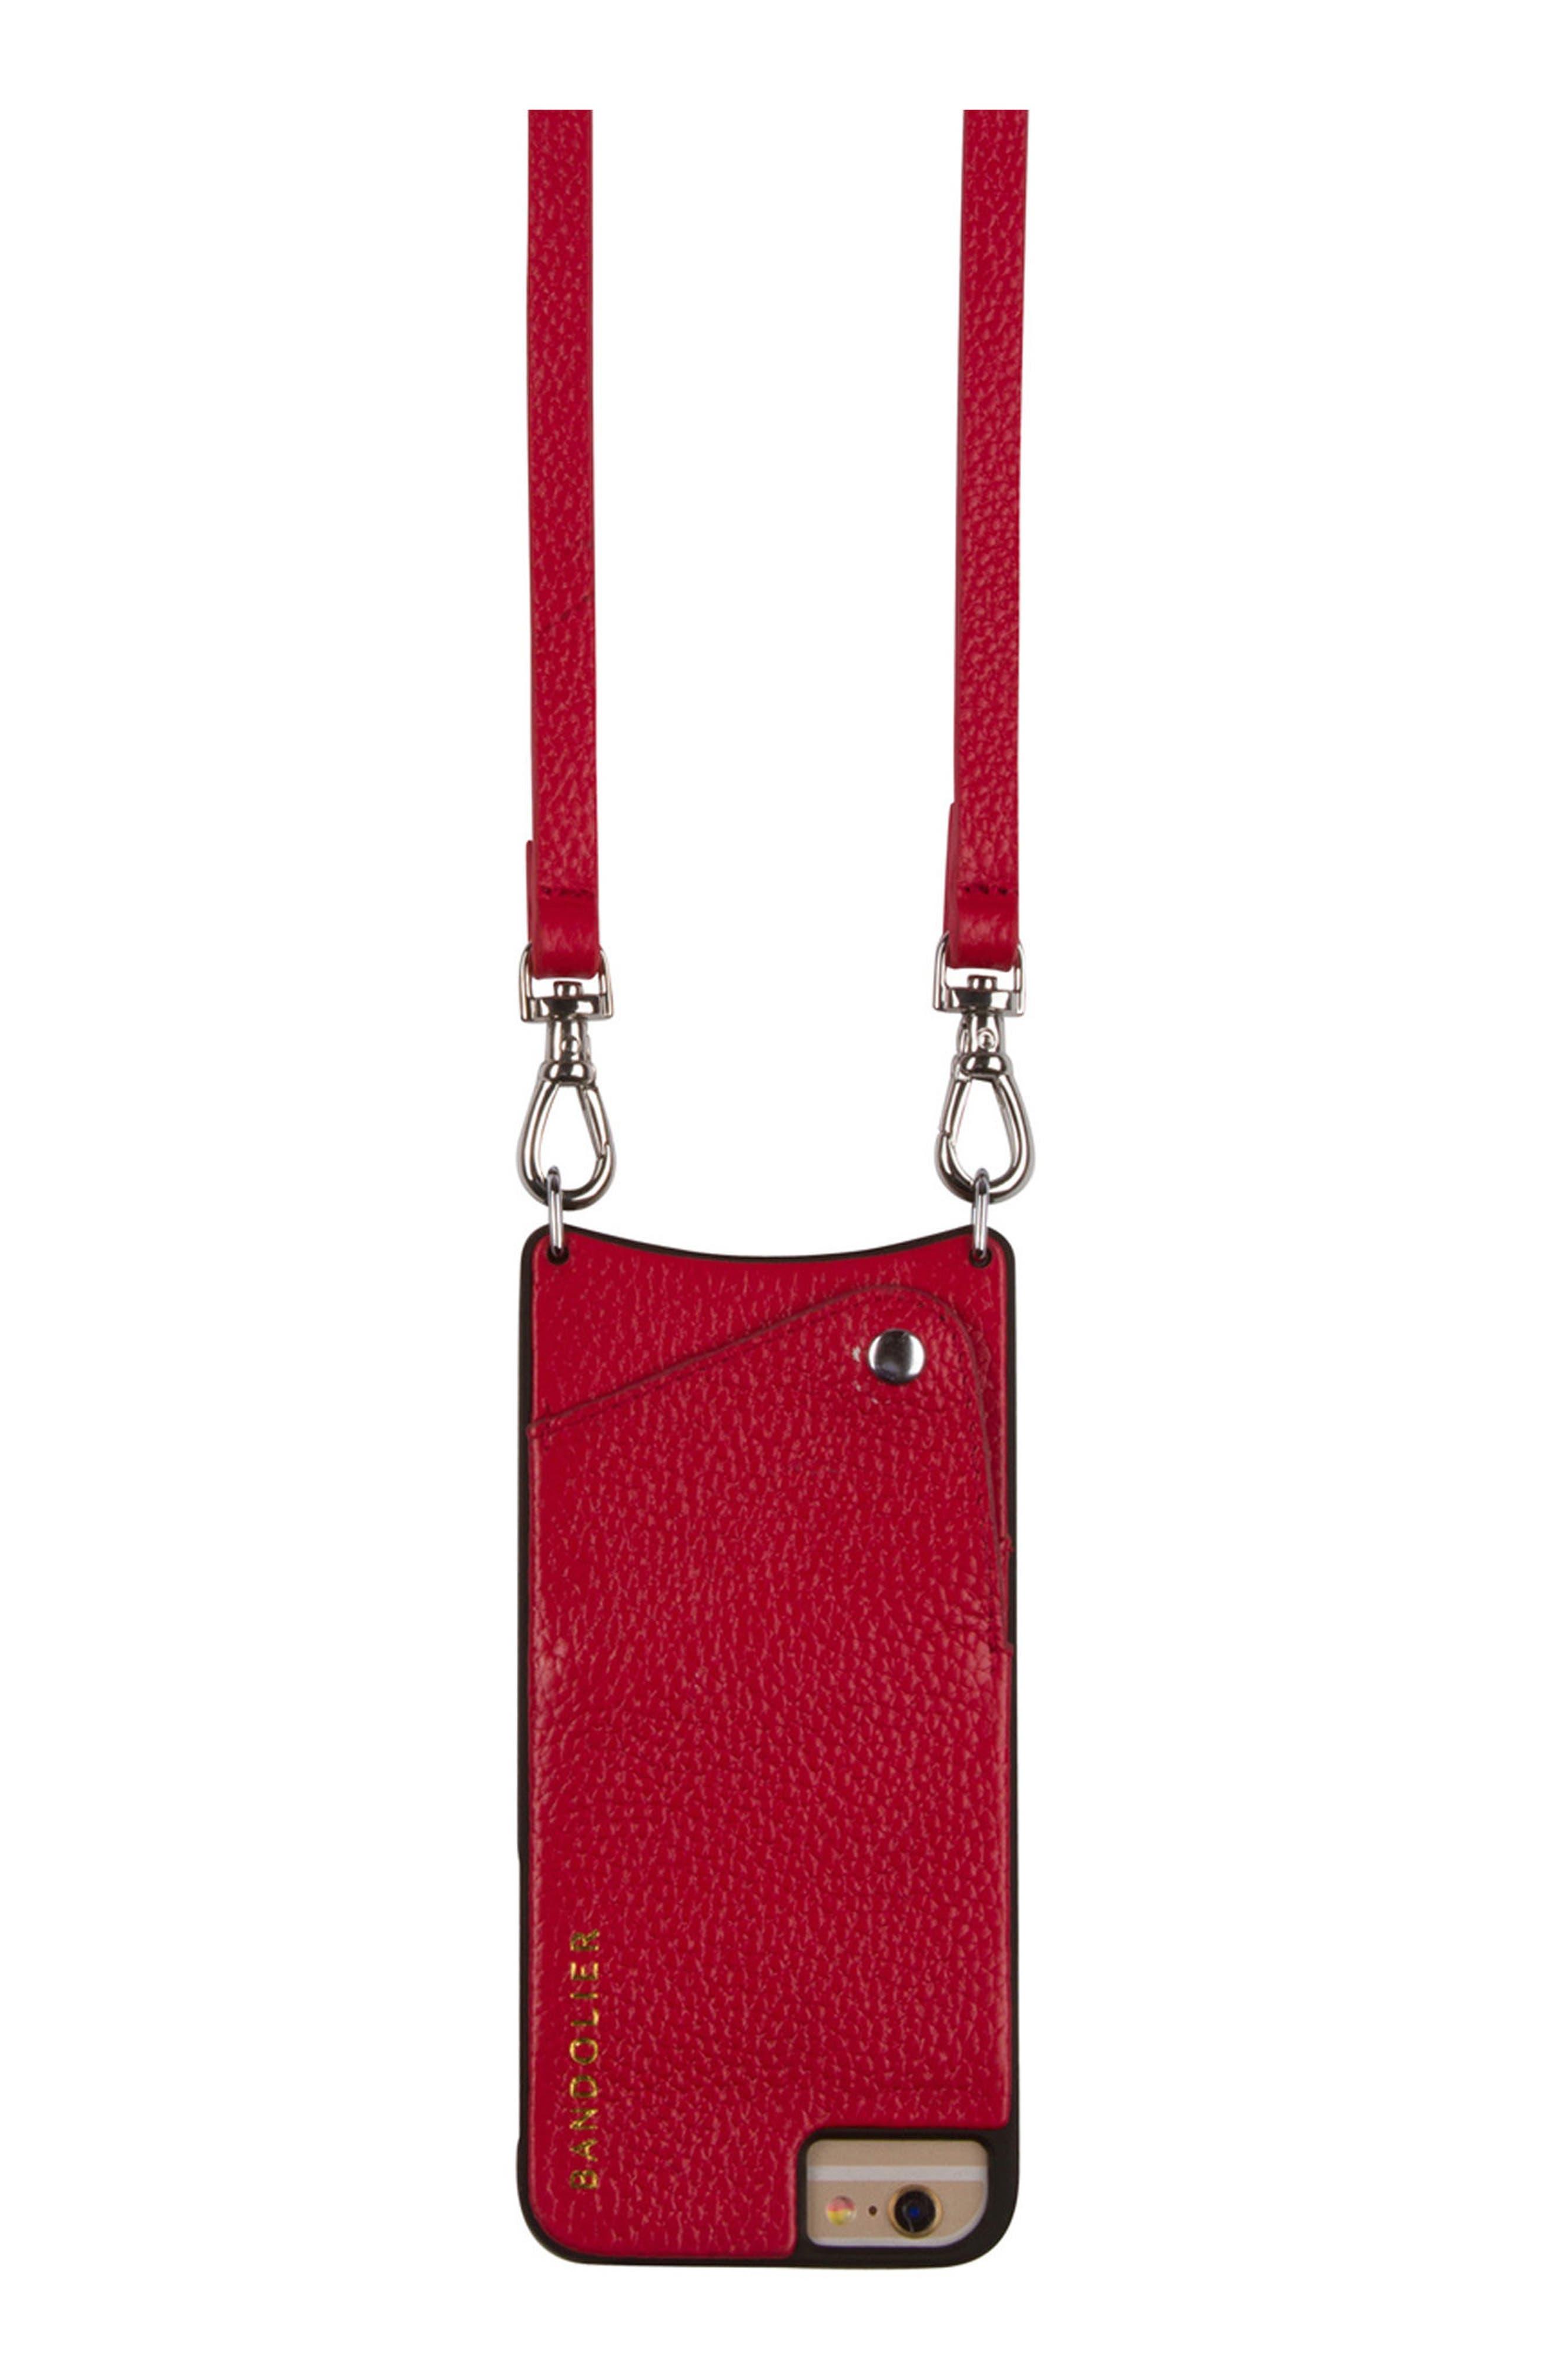 Bandolier Emma iPhone 6/6s/7/8 Plus Leather Crossbody Case